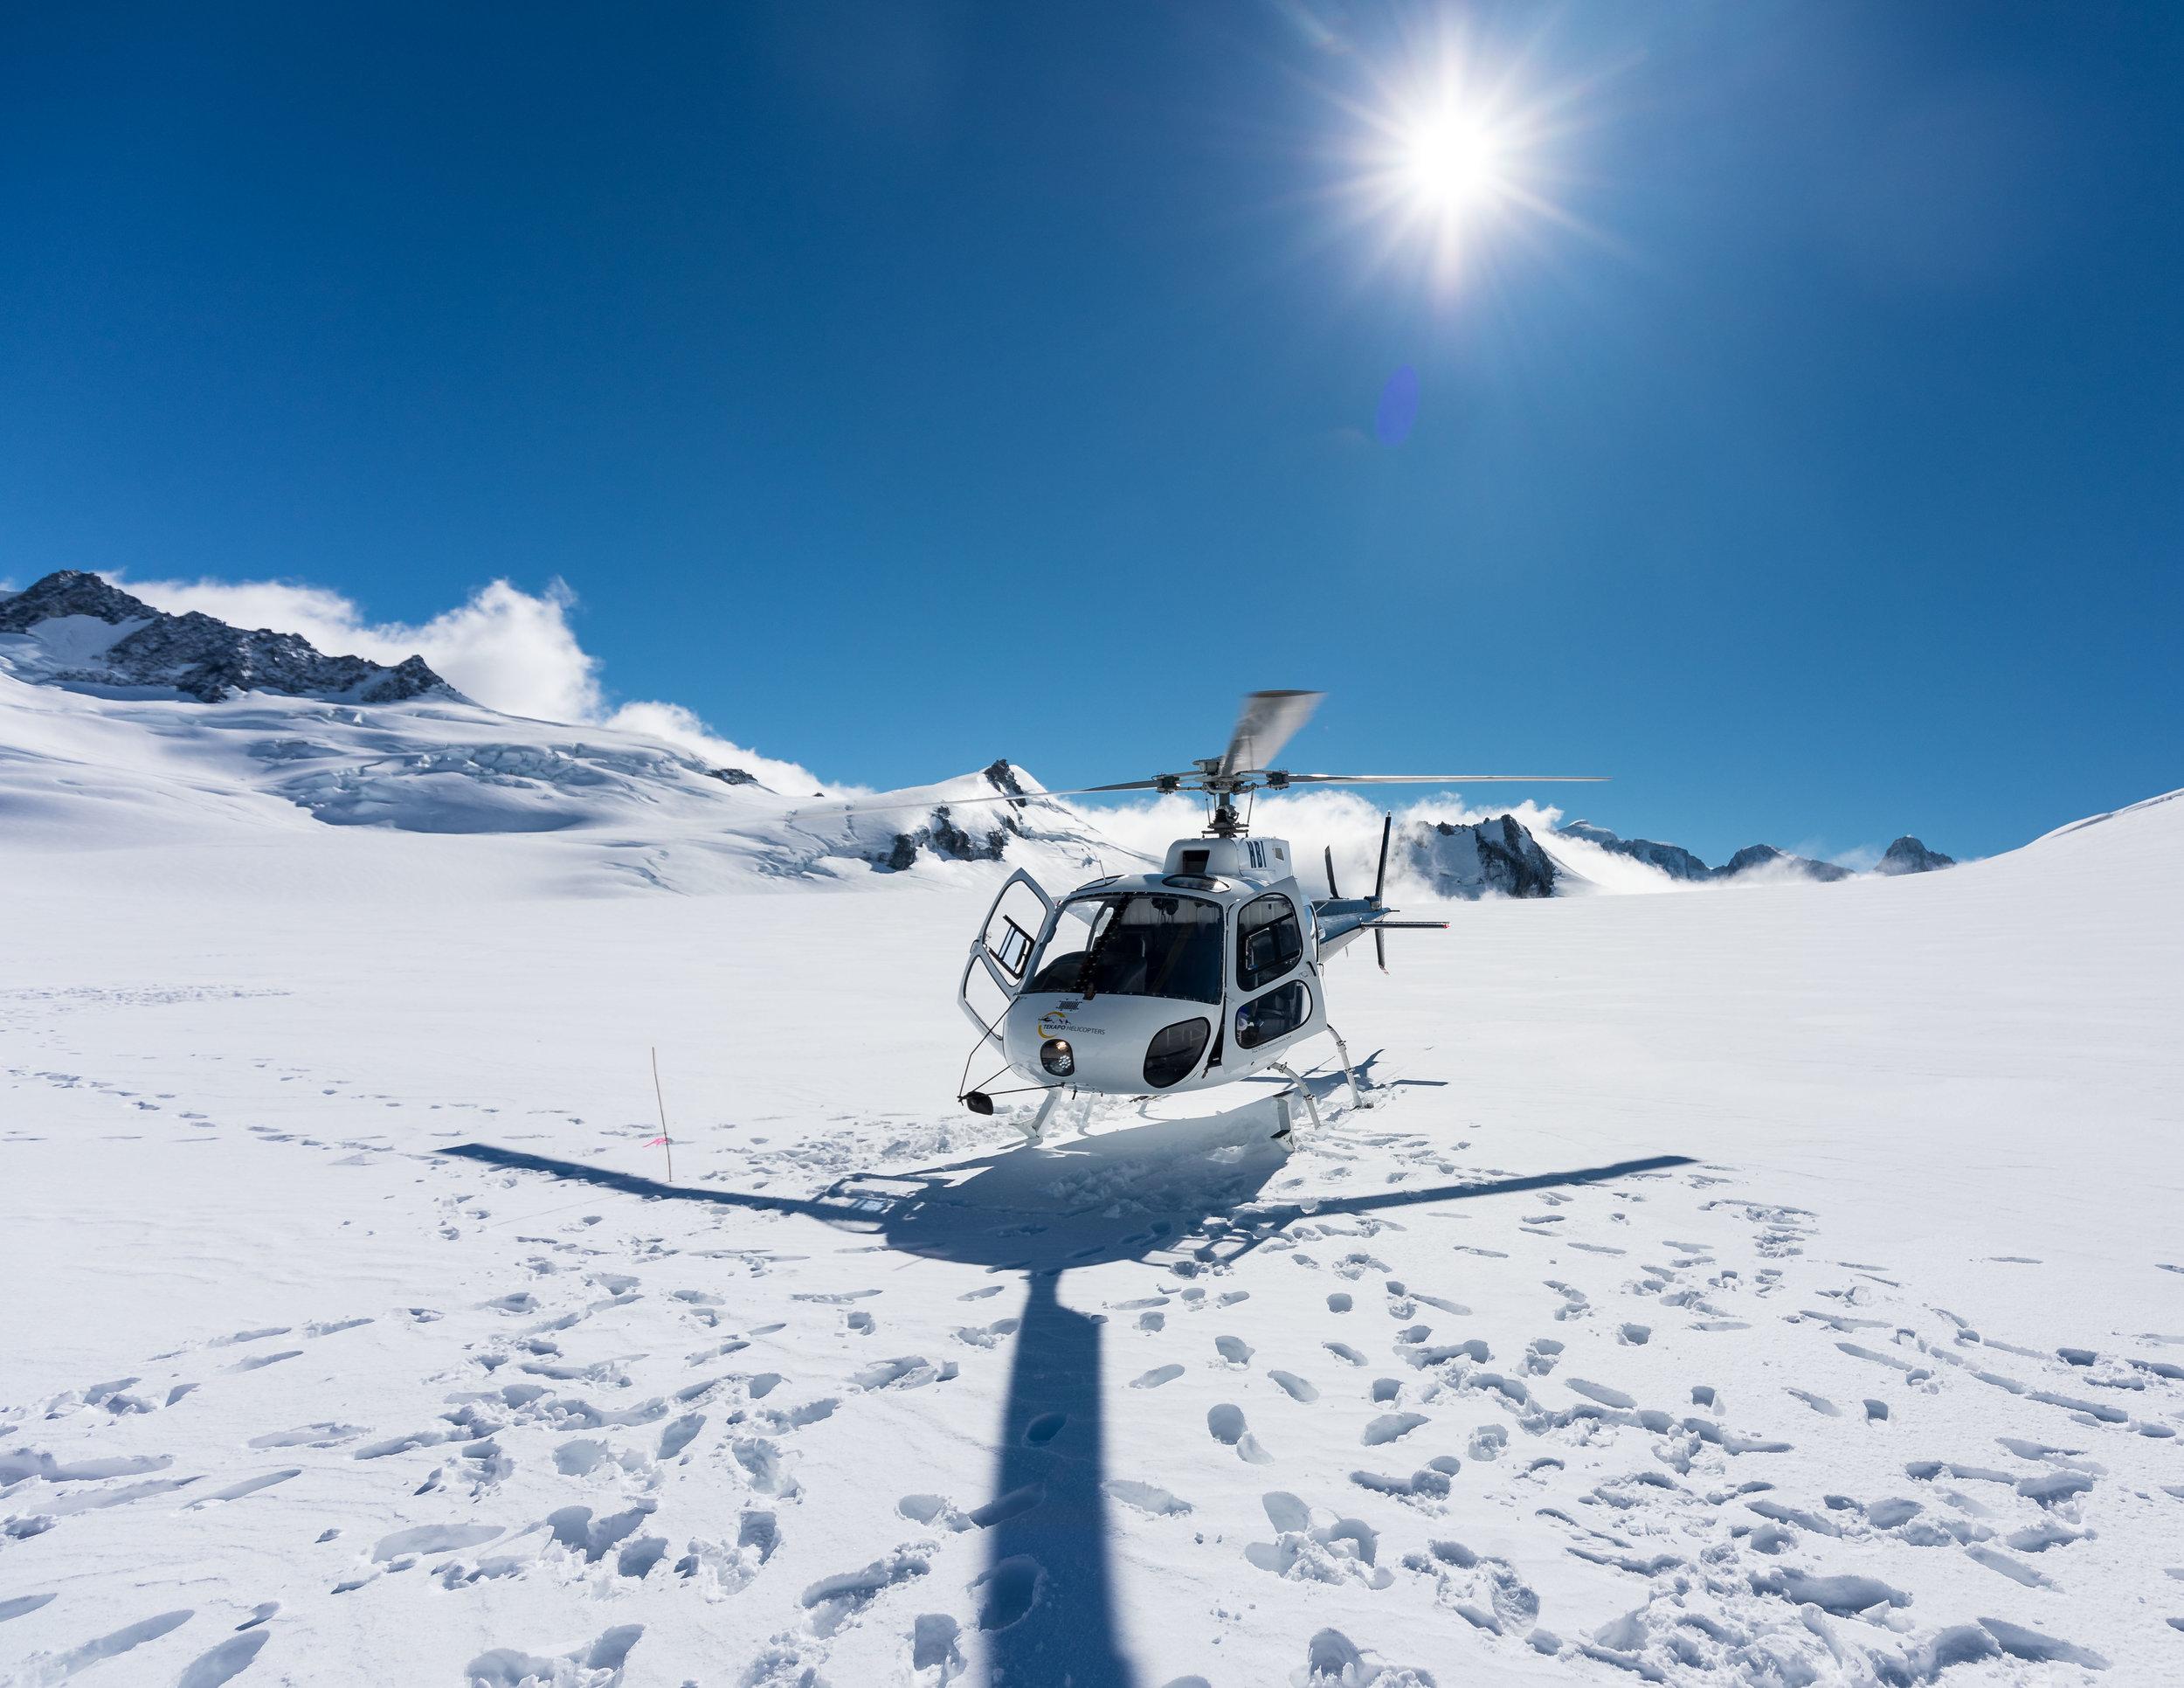 Helicopter on Franz Josef Glacier, New Zealand